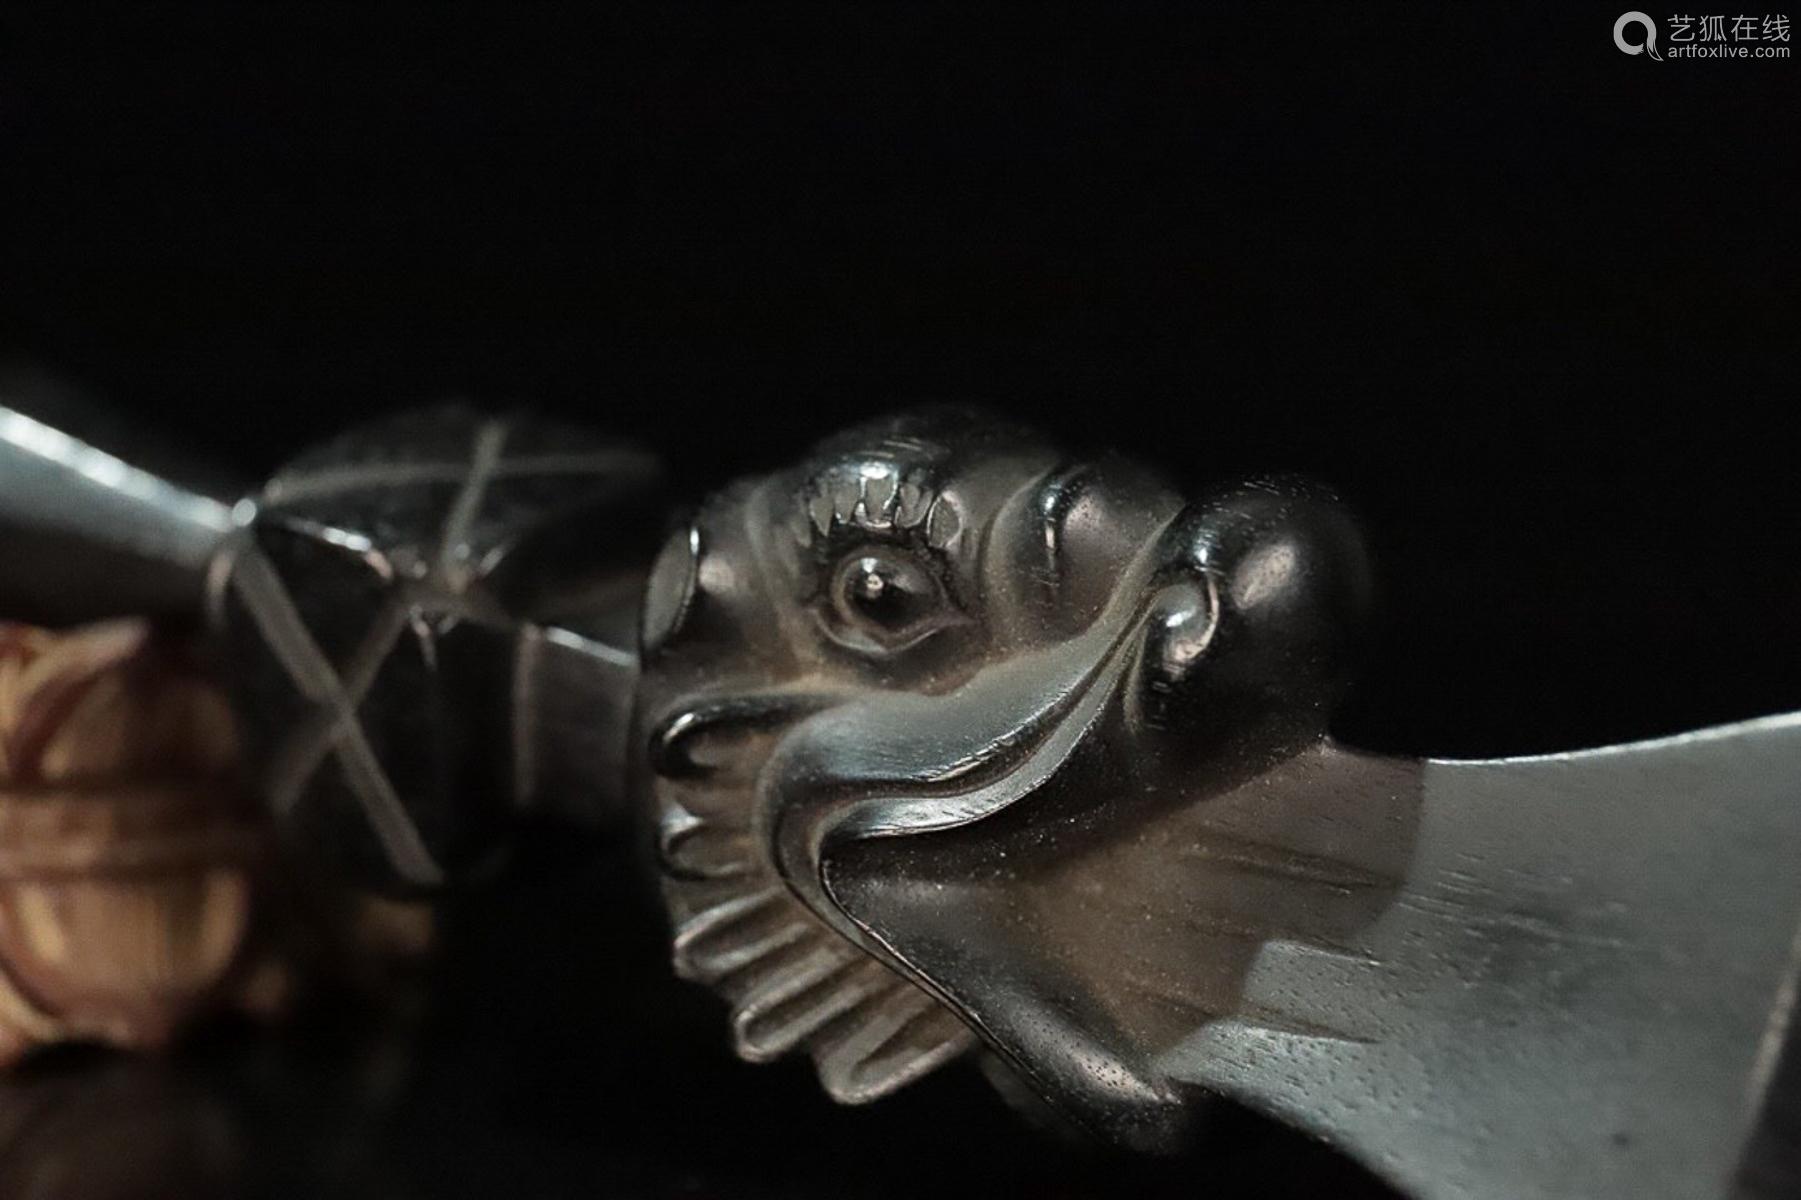 A ZITAN WOOD CARVED DRAGON PATTERN PENDANT